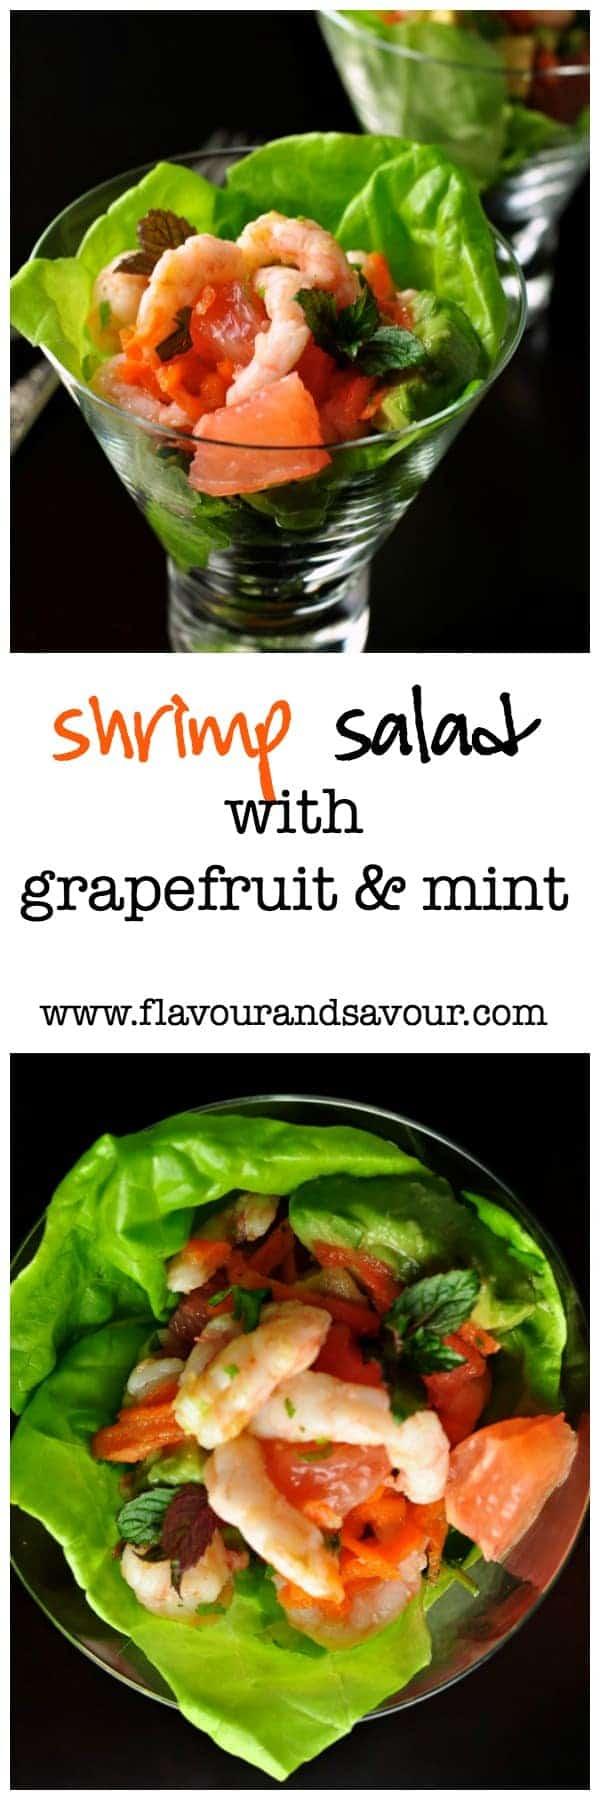 Shrimp Salad with Grapefruit and Mint. Amazing flavours in this fabulous salad!  www.flavourandsavour.com